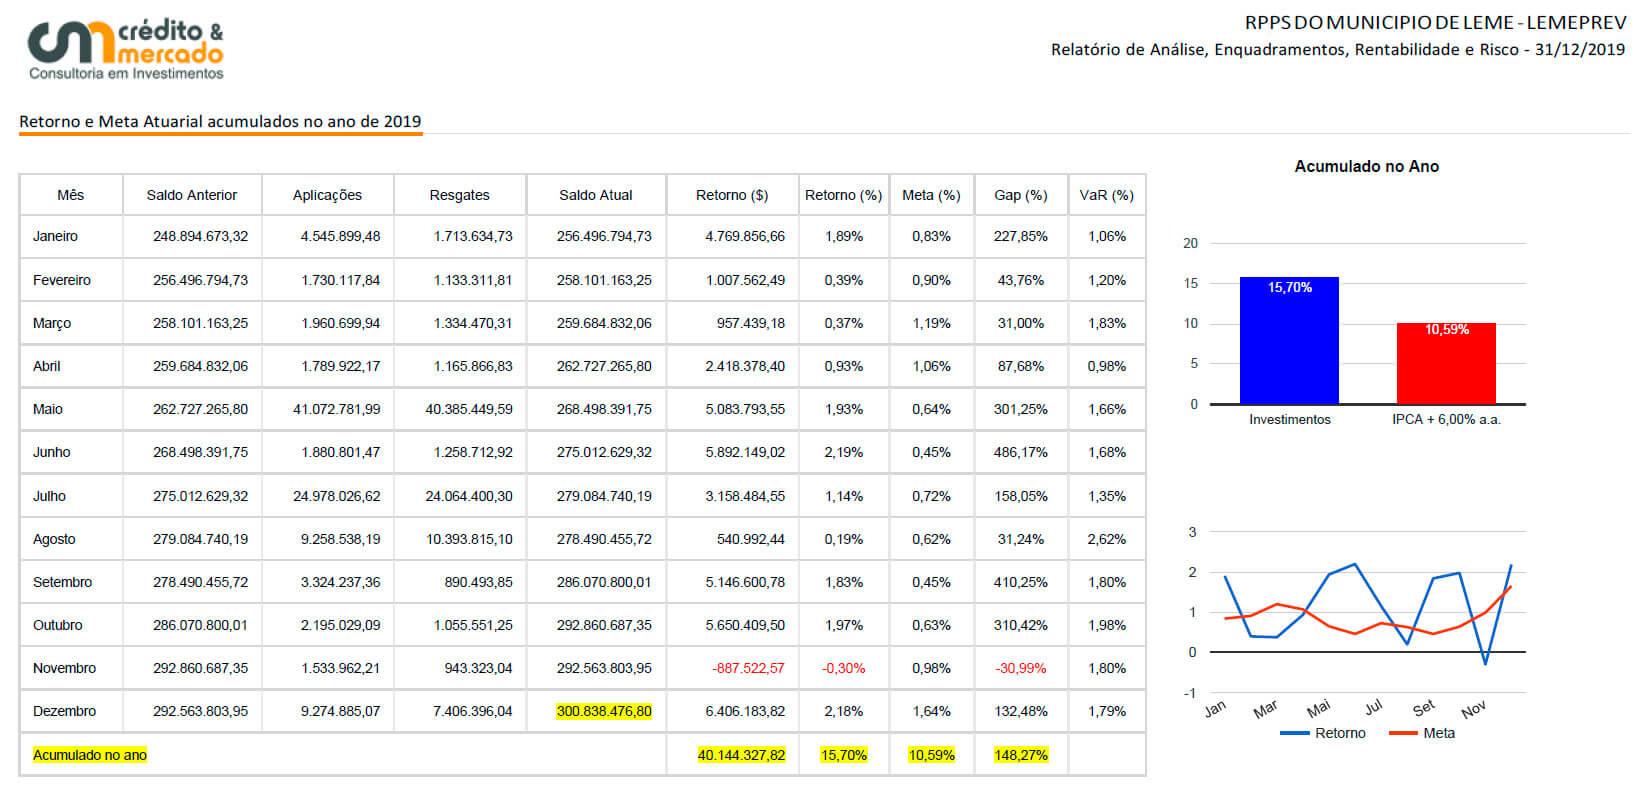 tabela de investimentos lemeprev